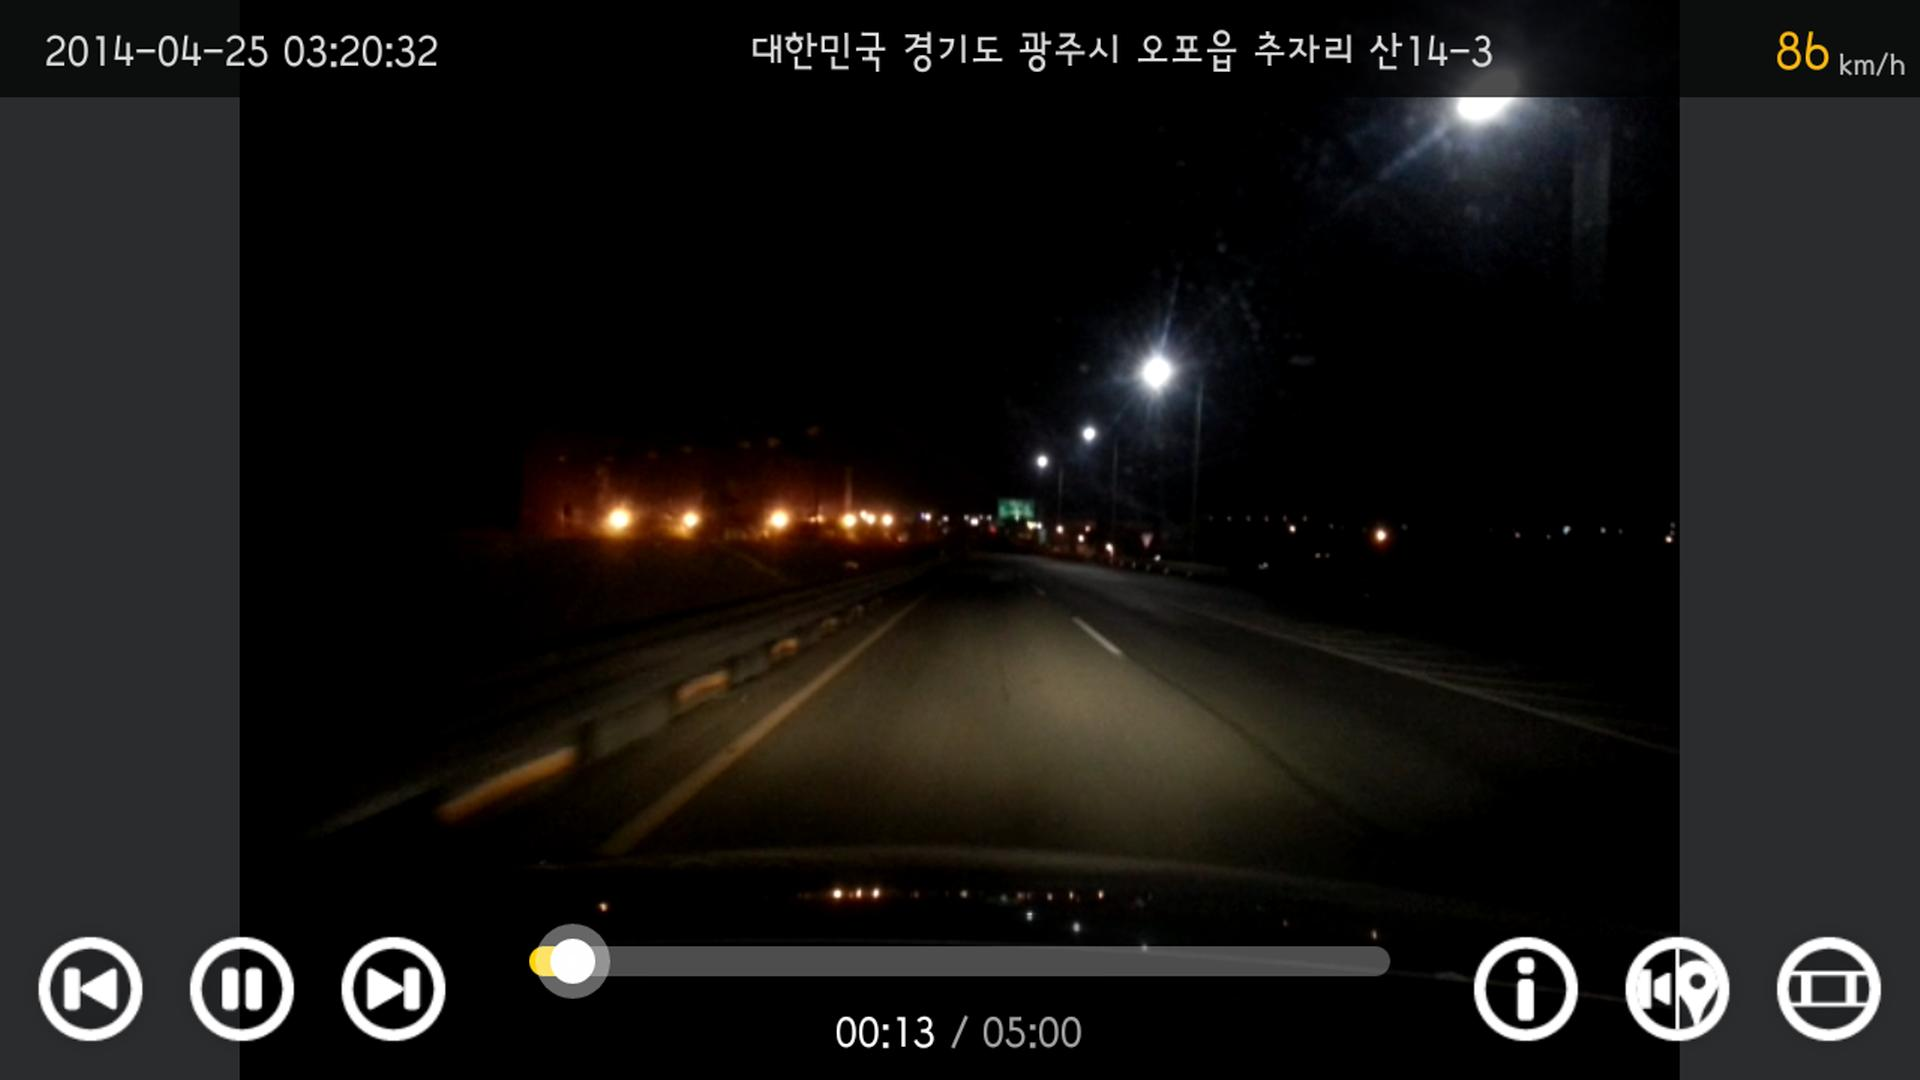 AutoBoy Dash Cam - BlackBox 3.8.0 Screenshot 6